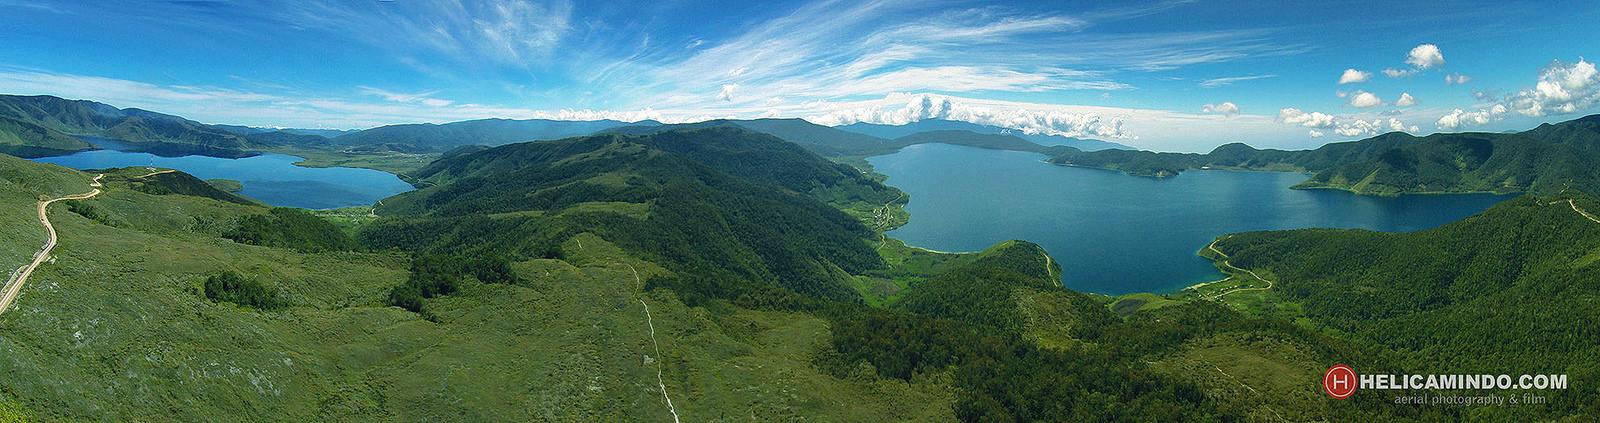 Misteri Danau Sepasang Kekasih Pegunungan Arfak Pace Bro Aerial Panoramic